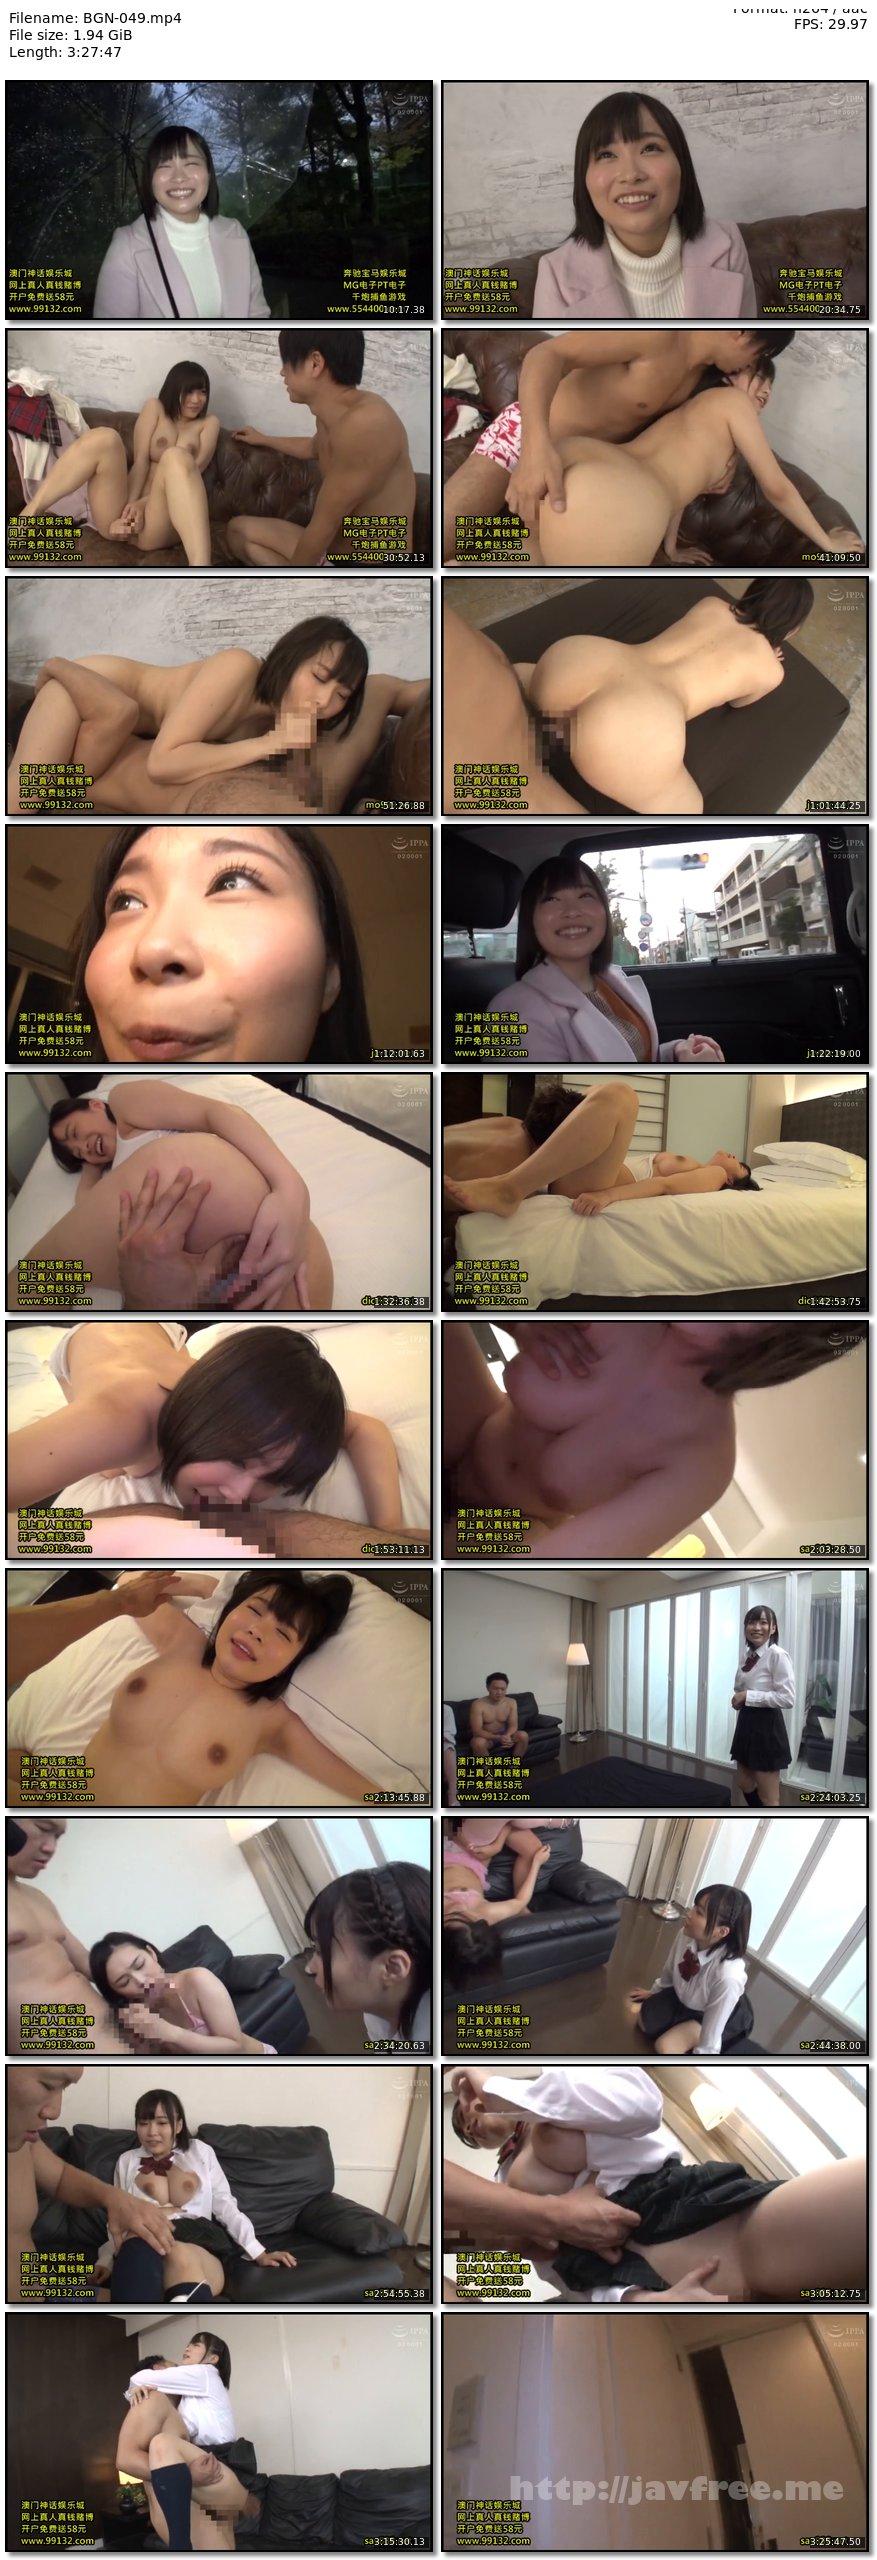 [BGN-049] 新人 プレステージ専属デビュー 河合あすな 奇跡の天然神乳Hカップ